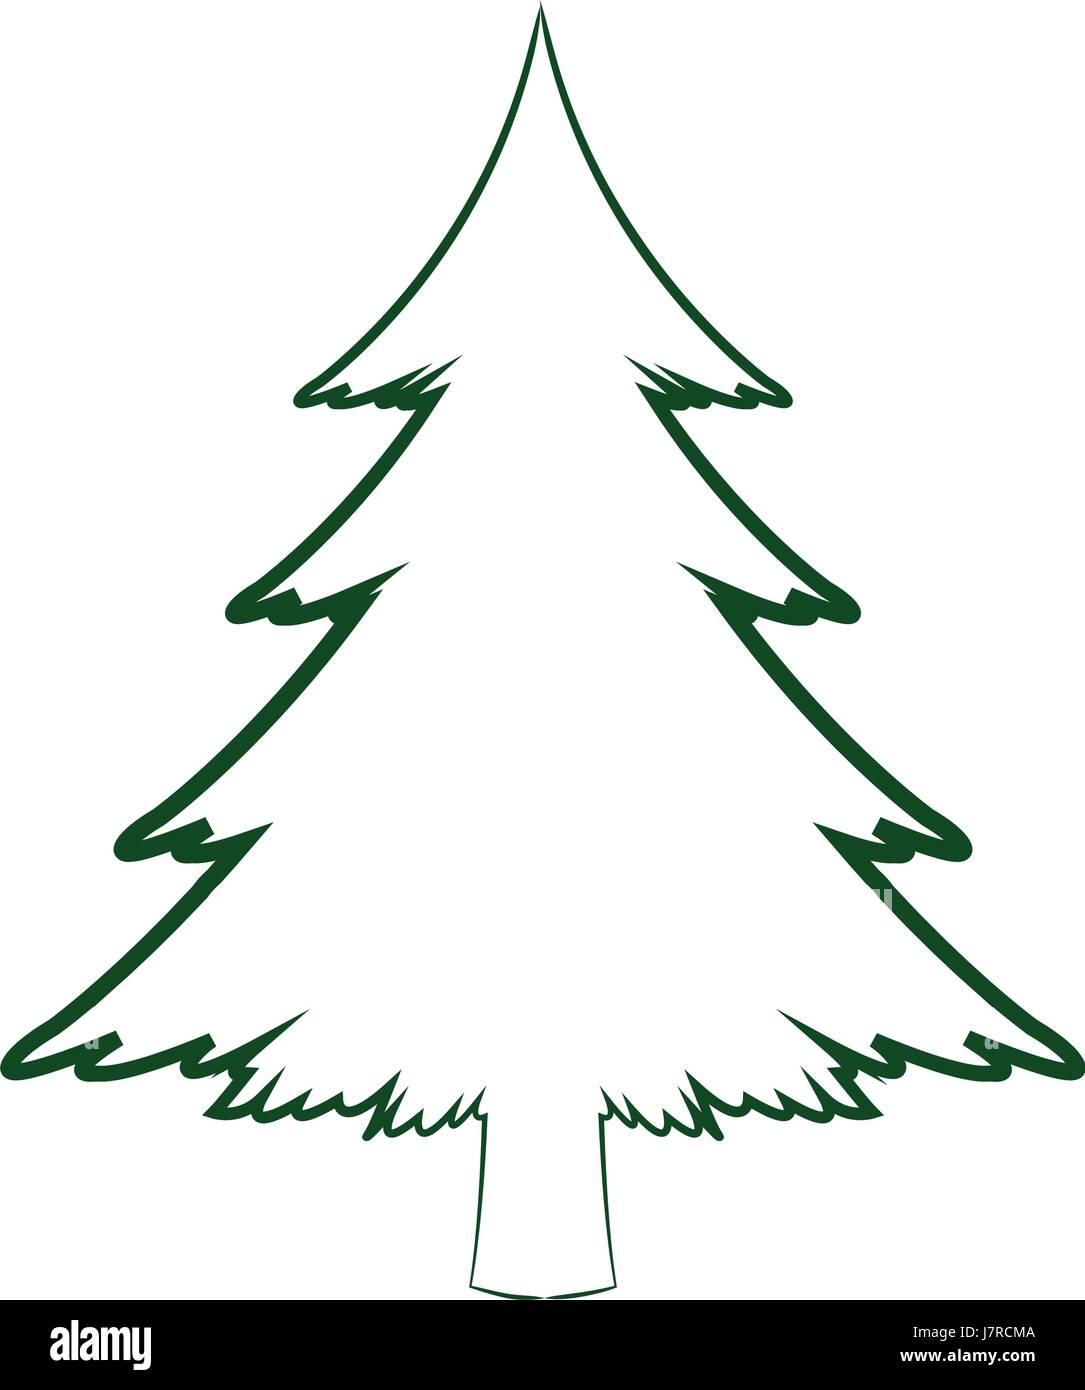 grüne Silhouette Kiefer Baum Weihnachten Feier winter Stock Vektor